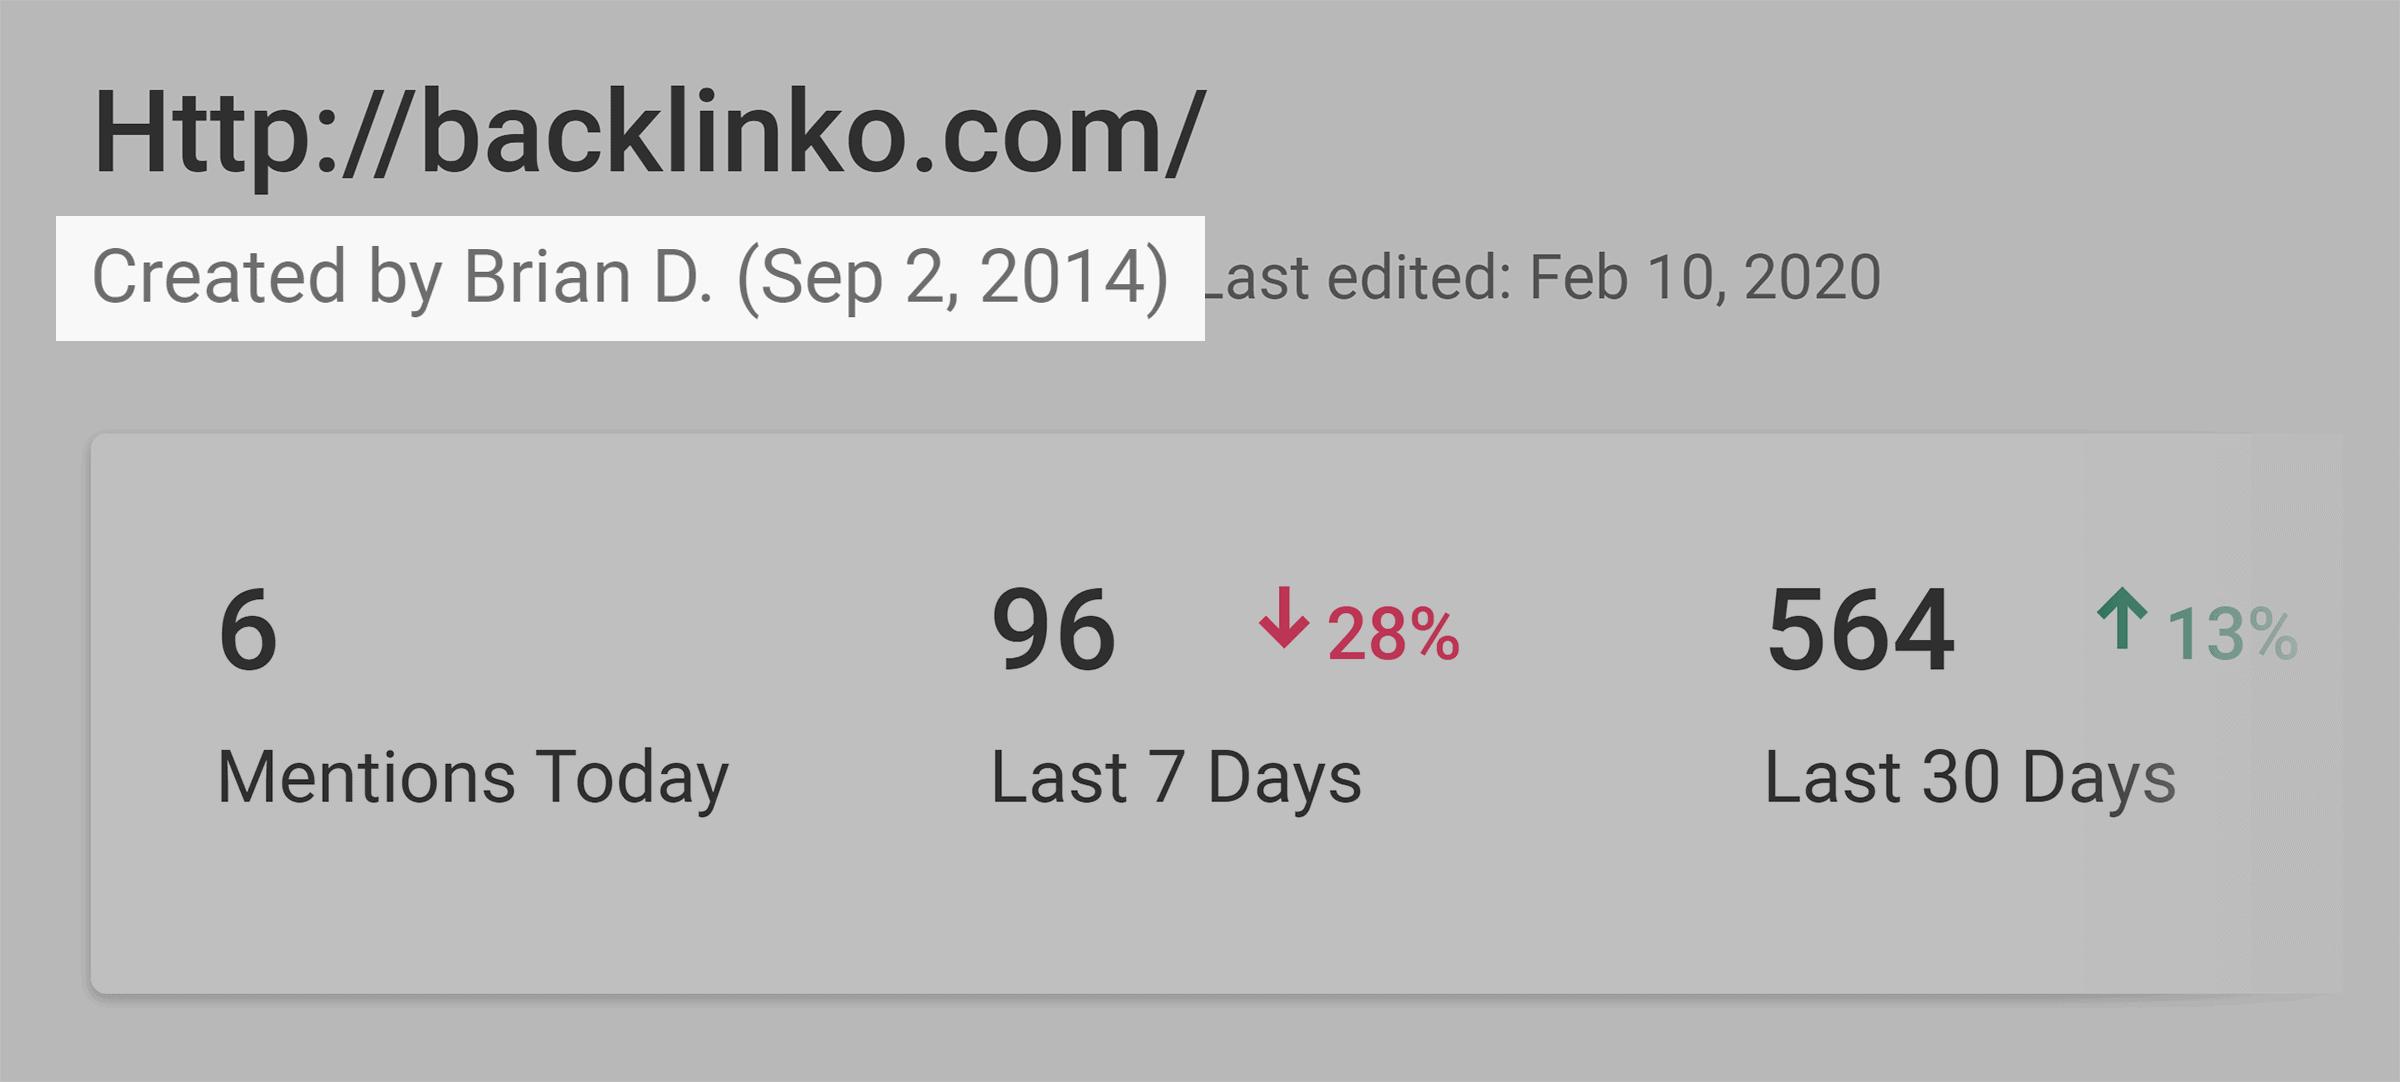 Buzzsumo – Backlinko – Monitoring since 2014